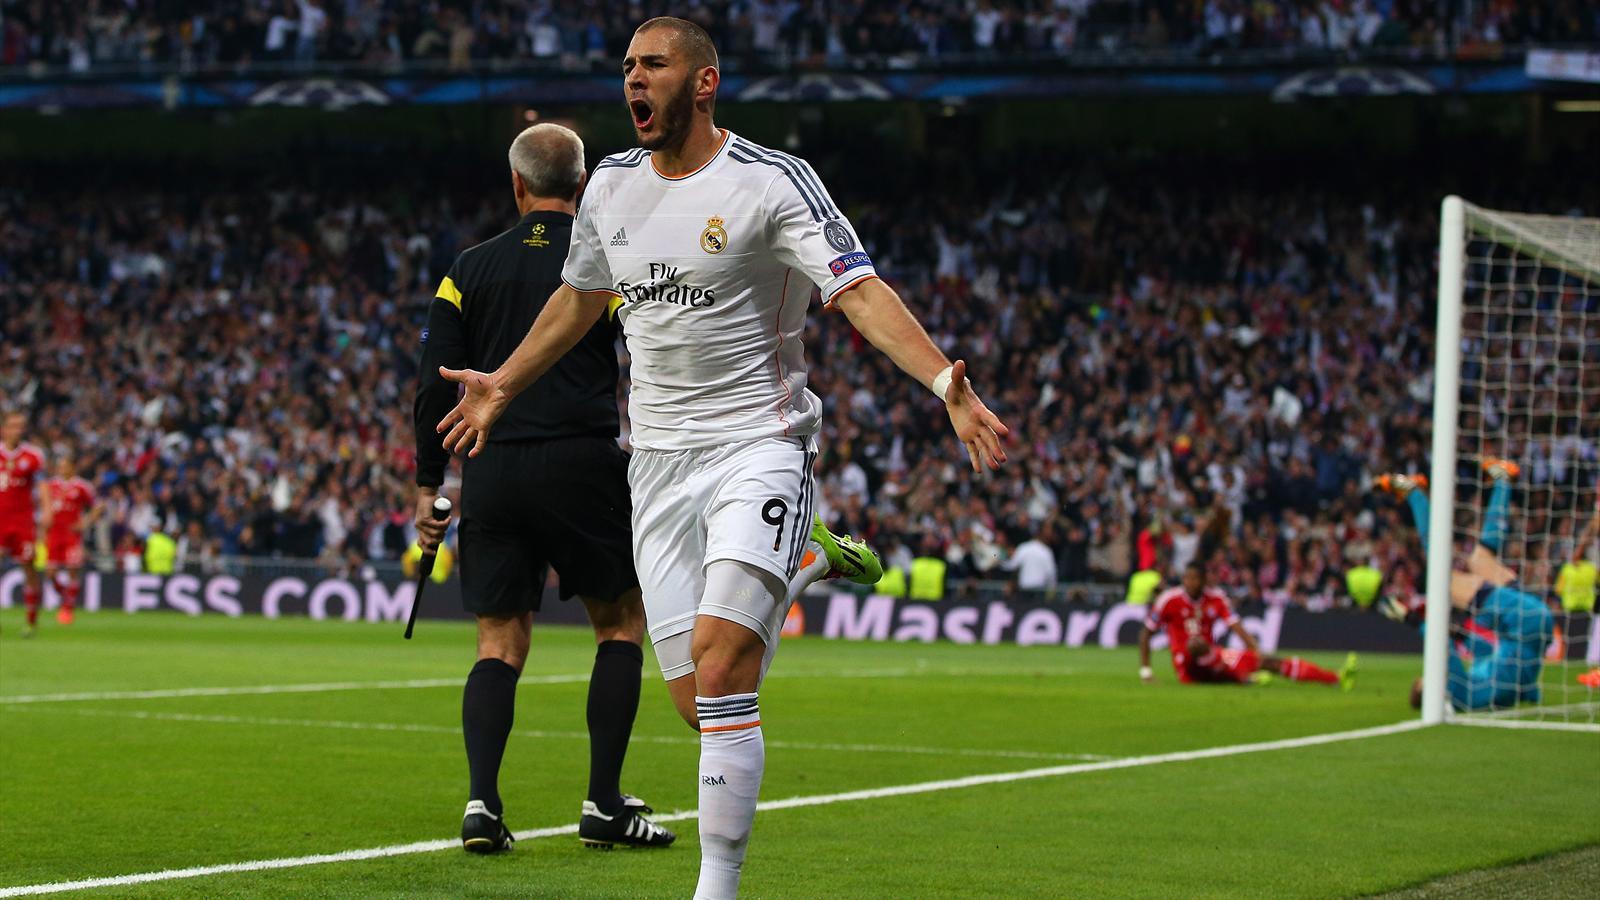 La joie de Karim Benzema (Real Madrid) face au Bayern